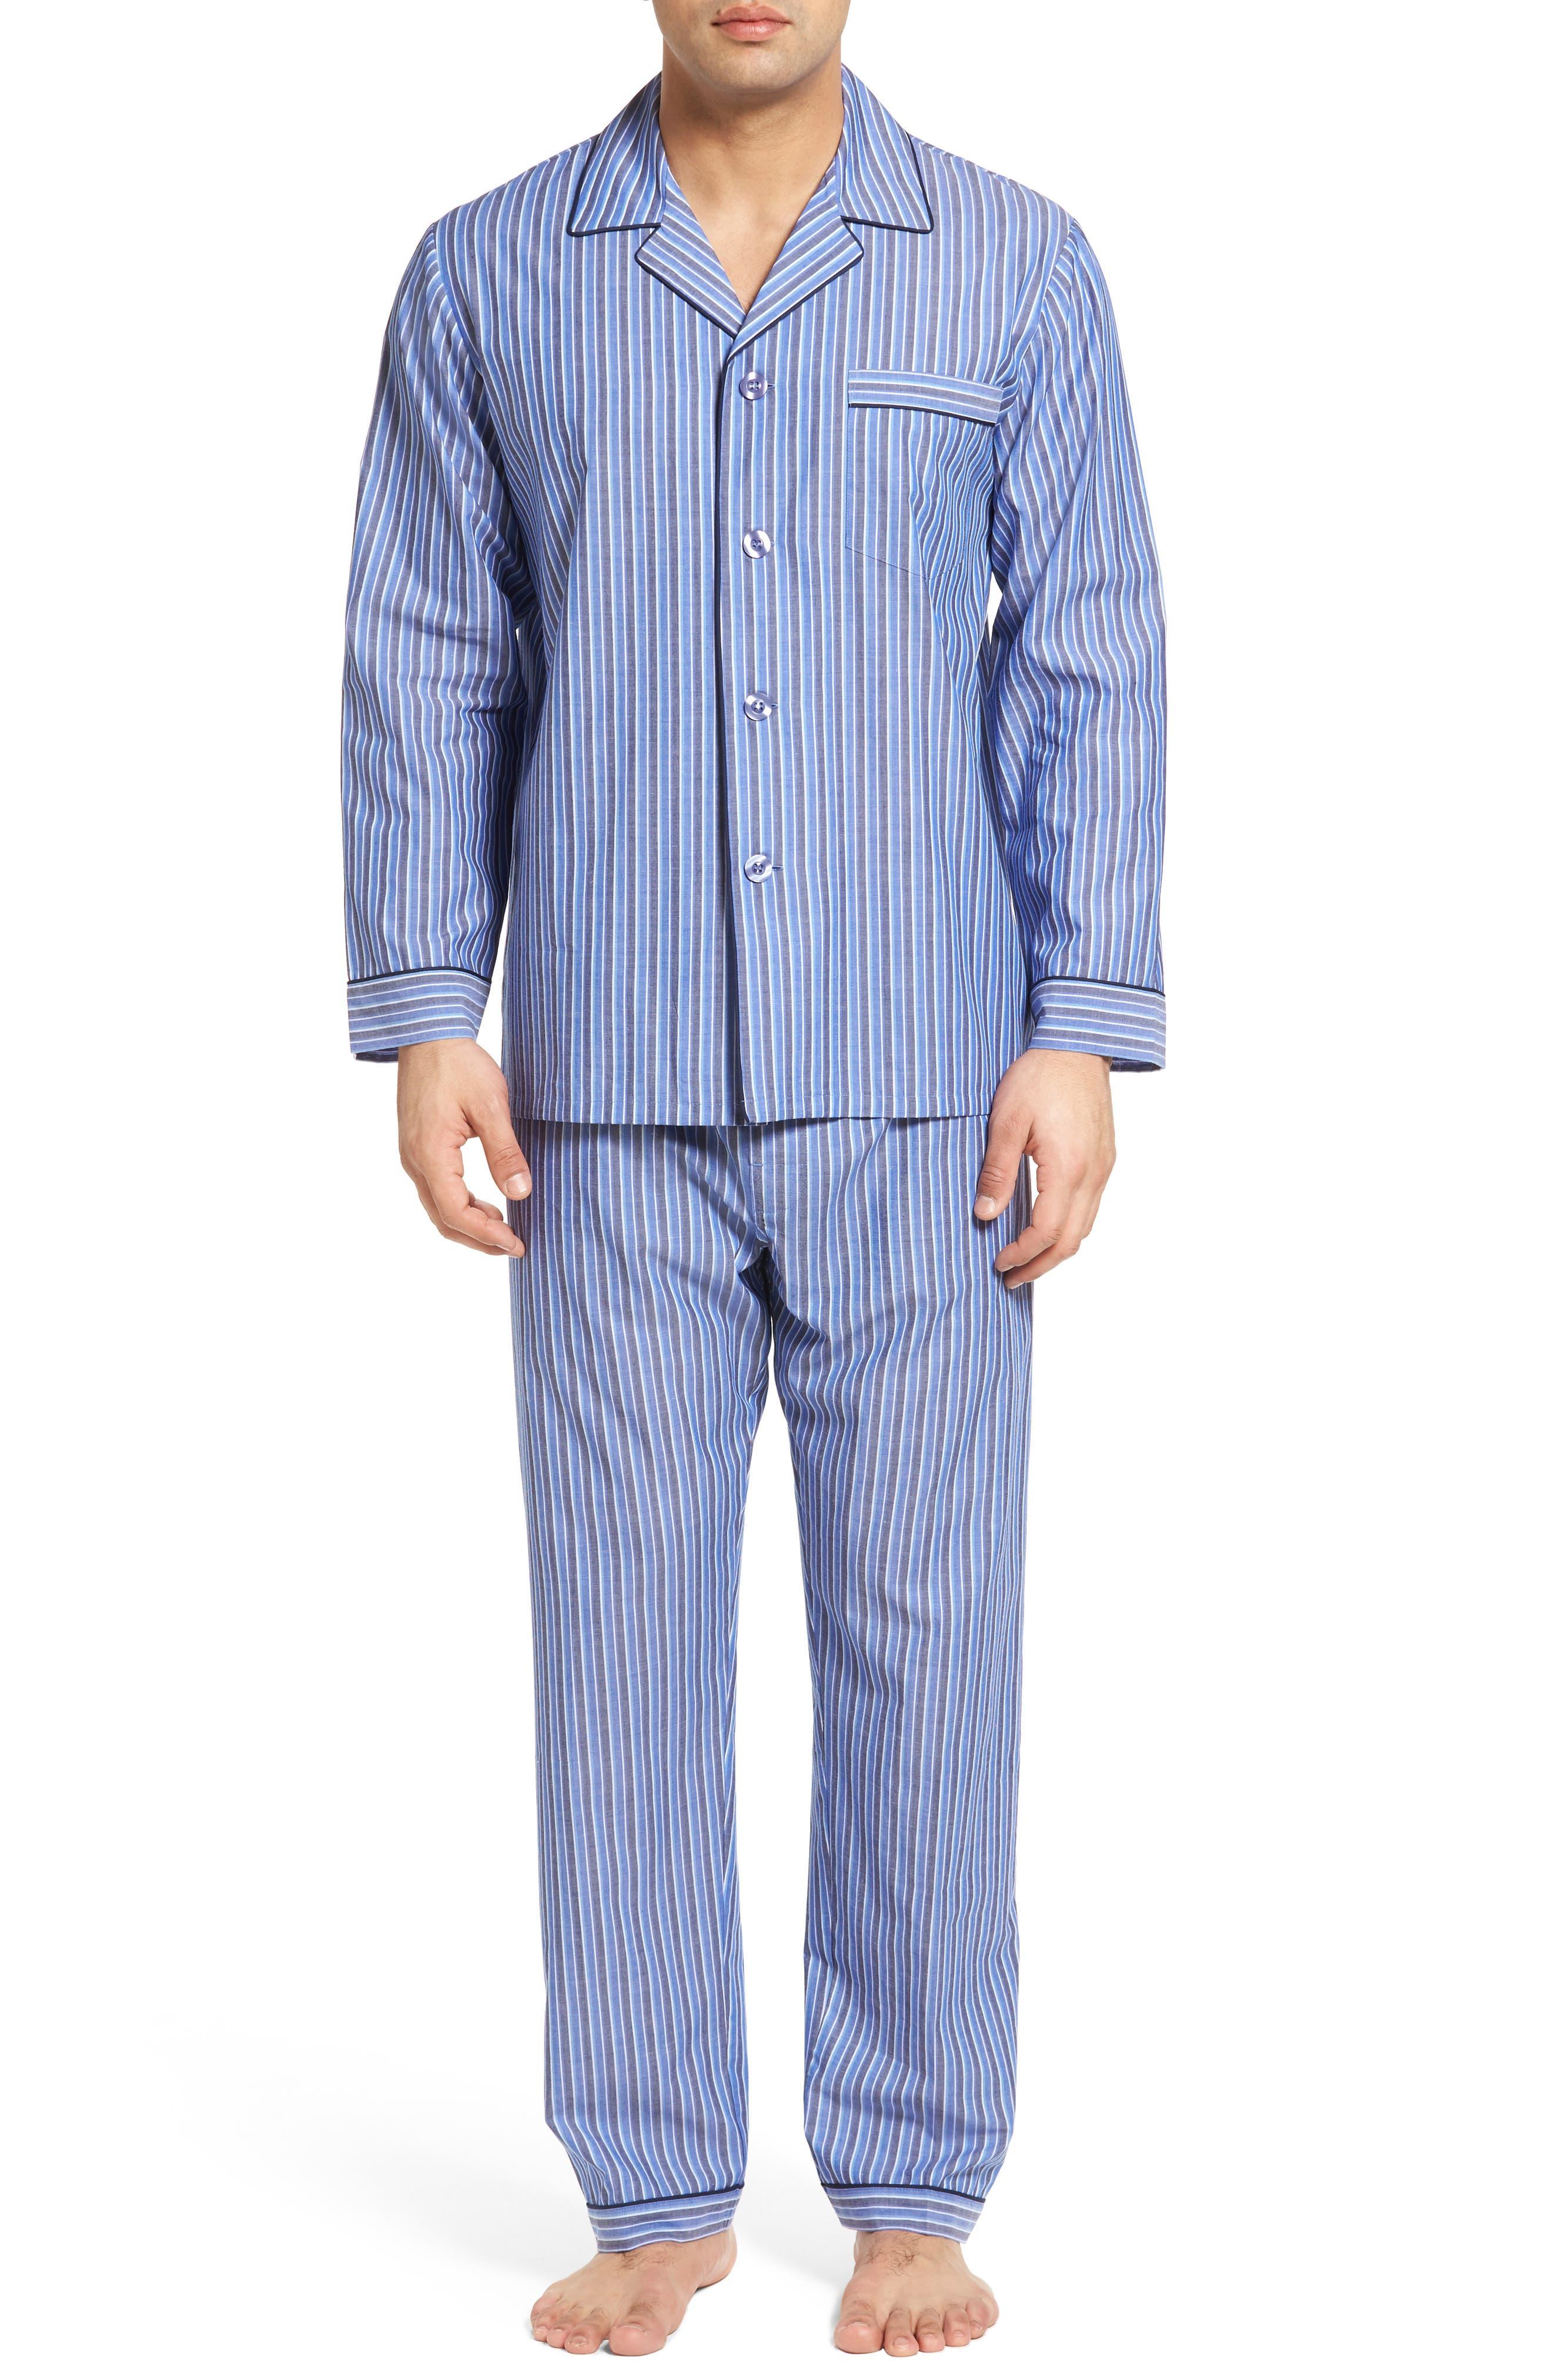 Main Image - Majestic International Cole Cotton Blend Pajama Set